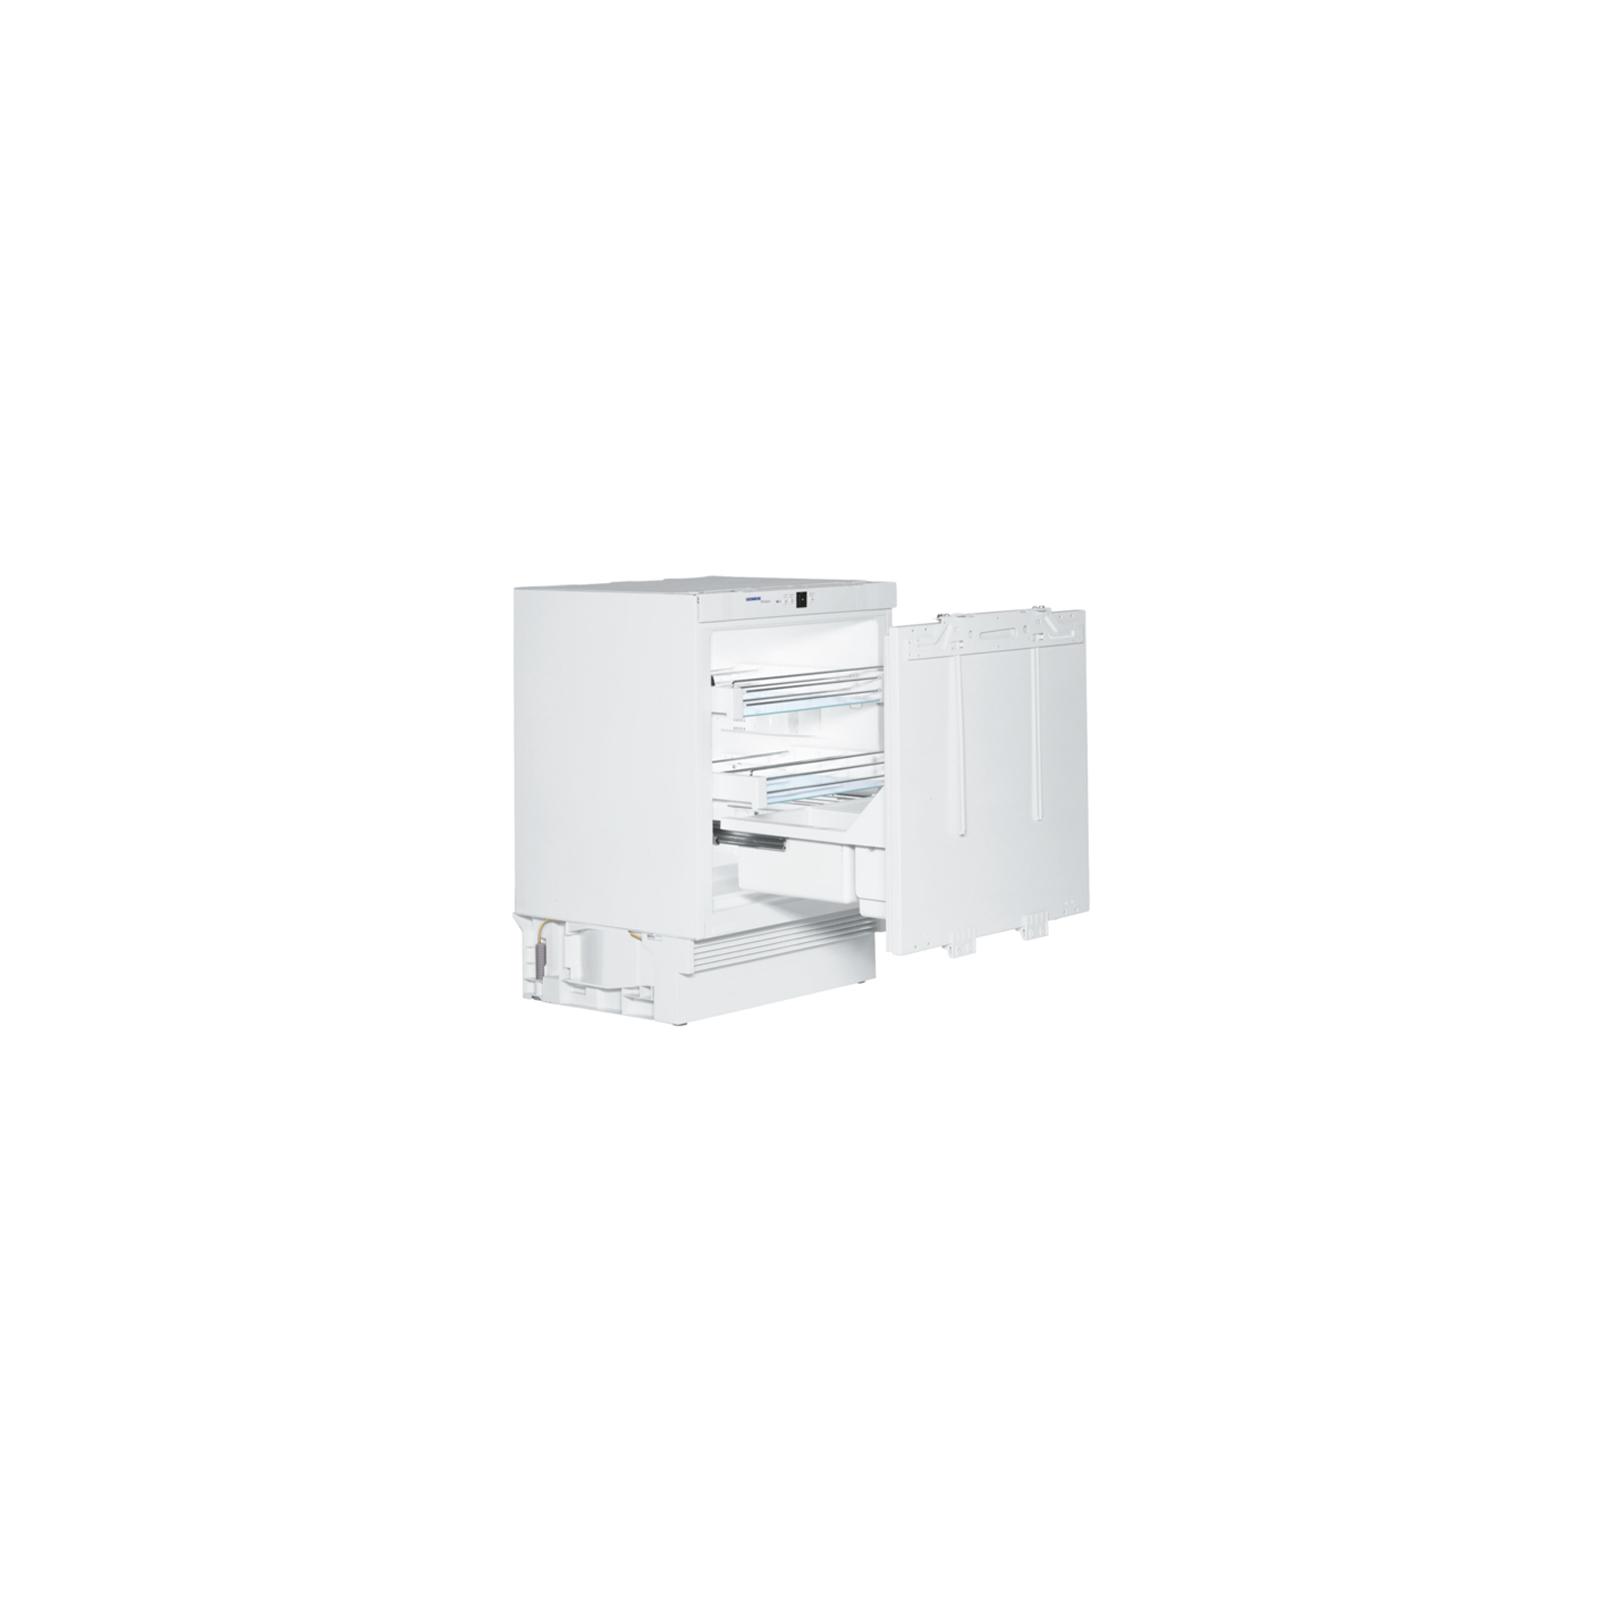 Холодильник Liebherr UIK 1550